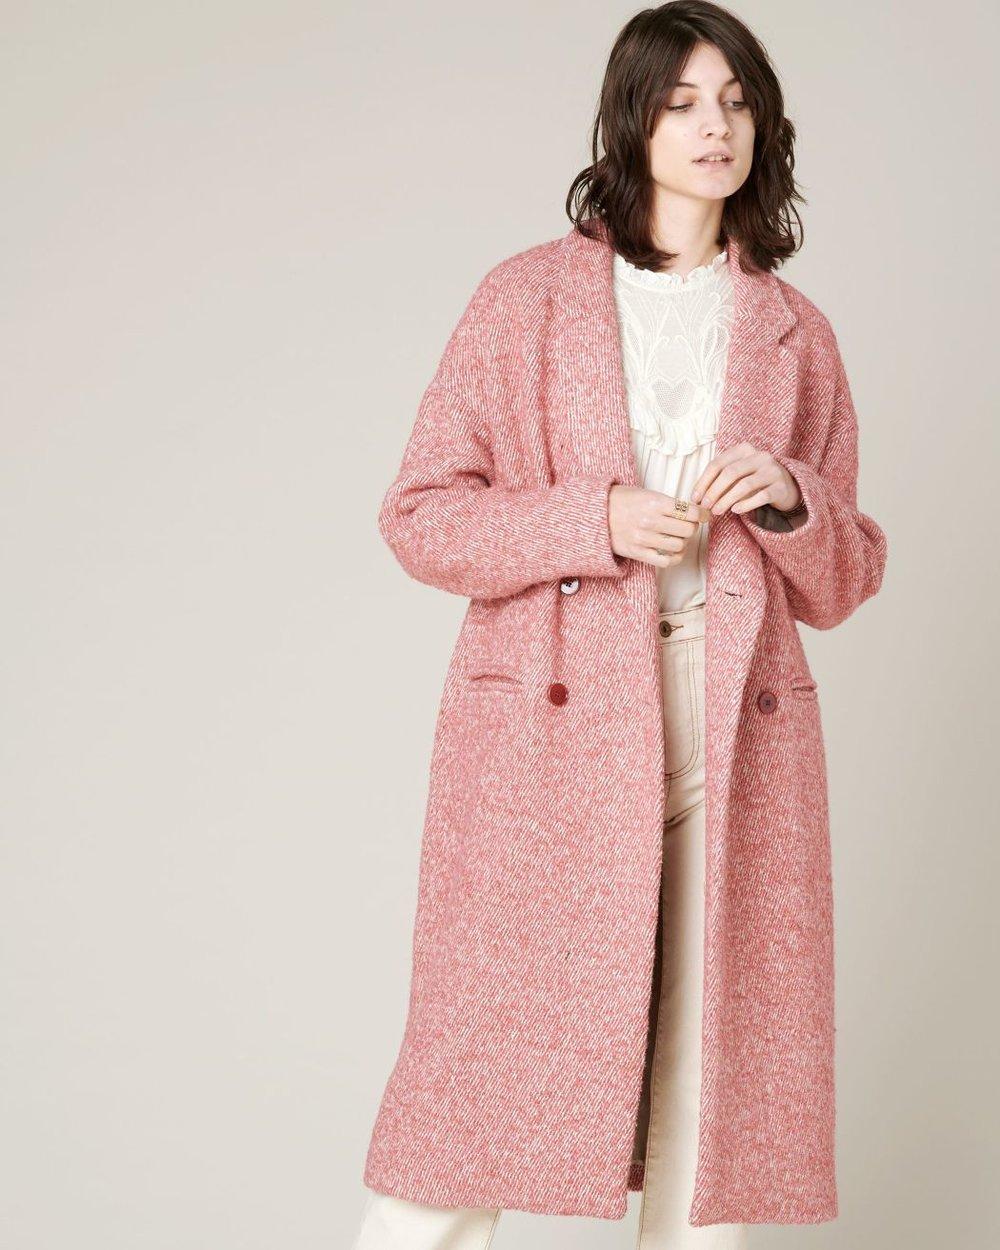 Pink jacquard coat from Sessùn